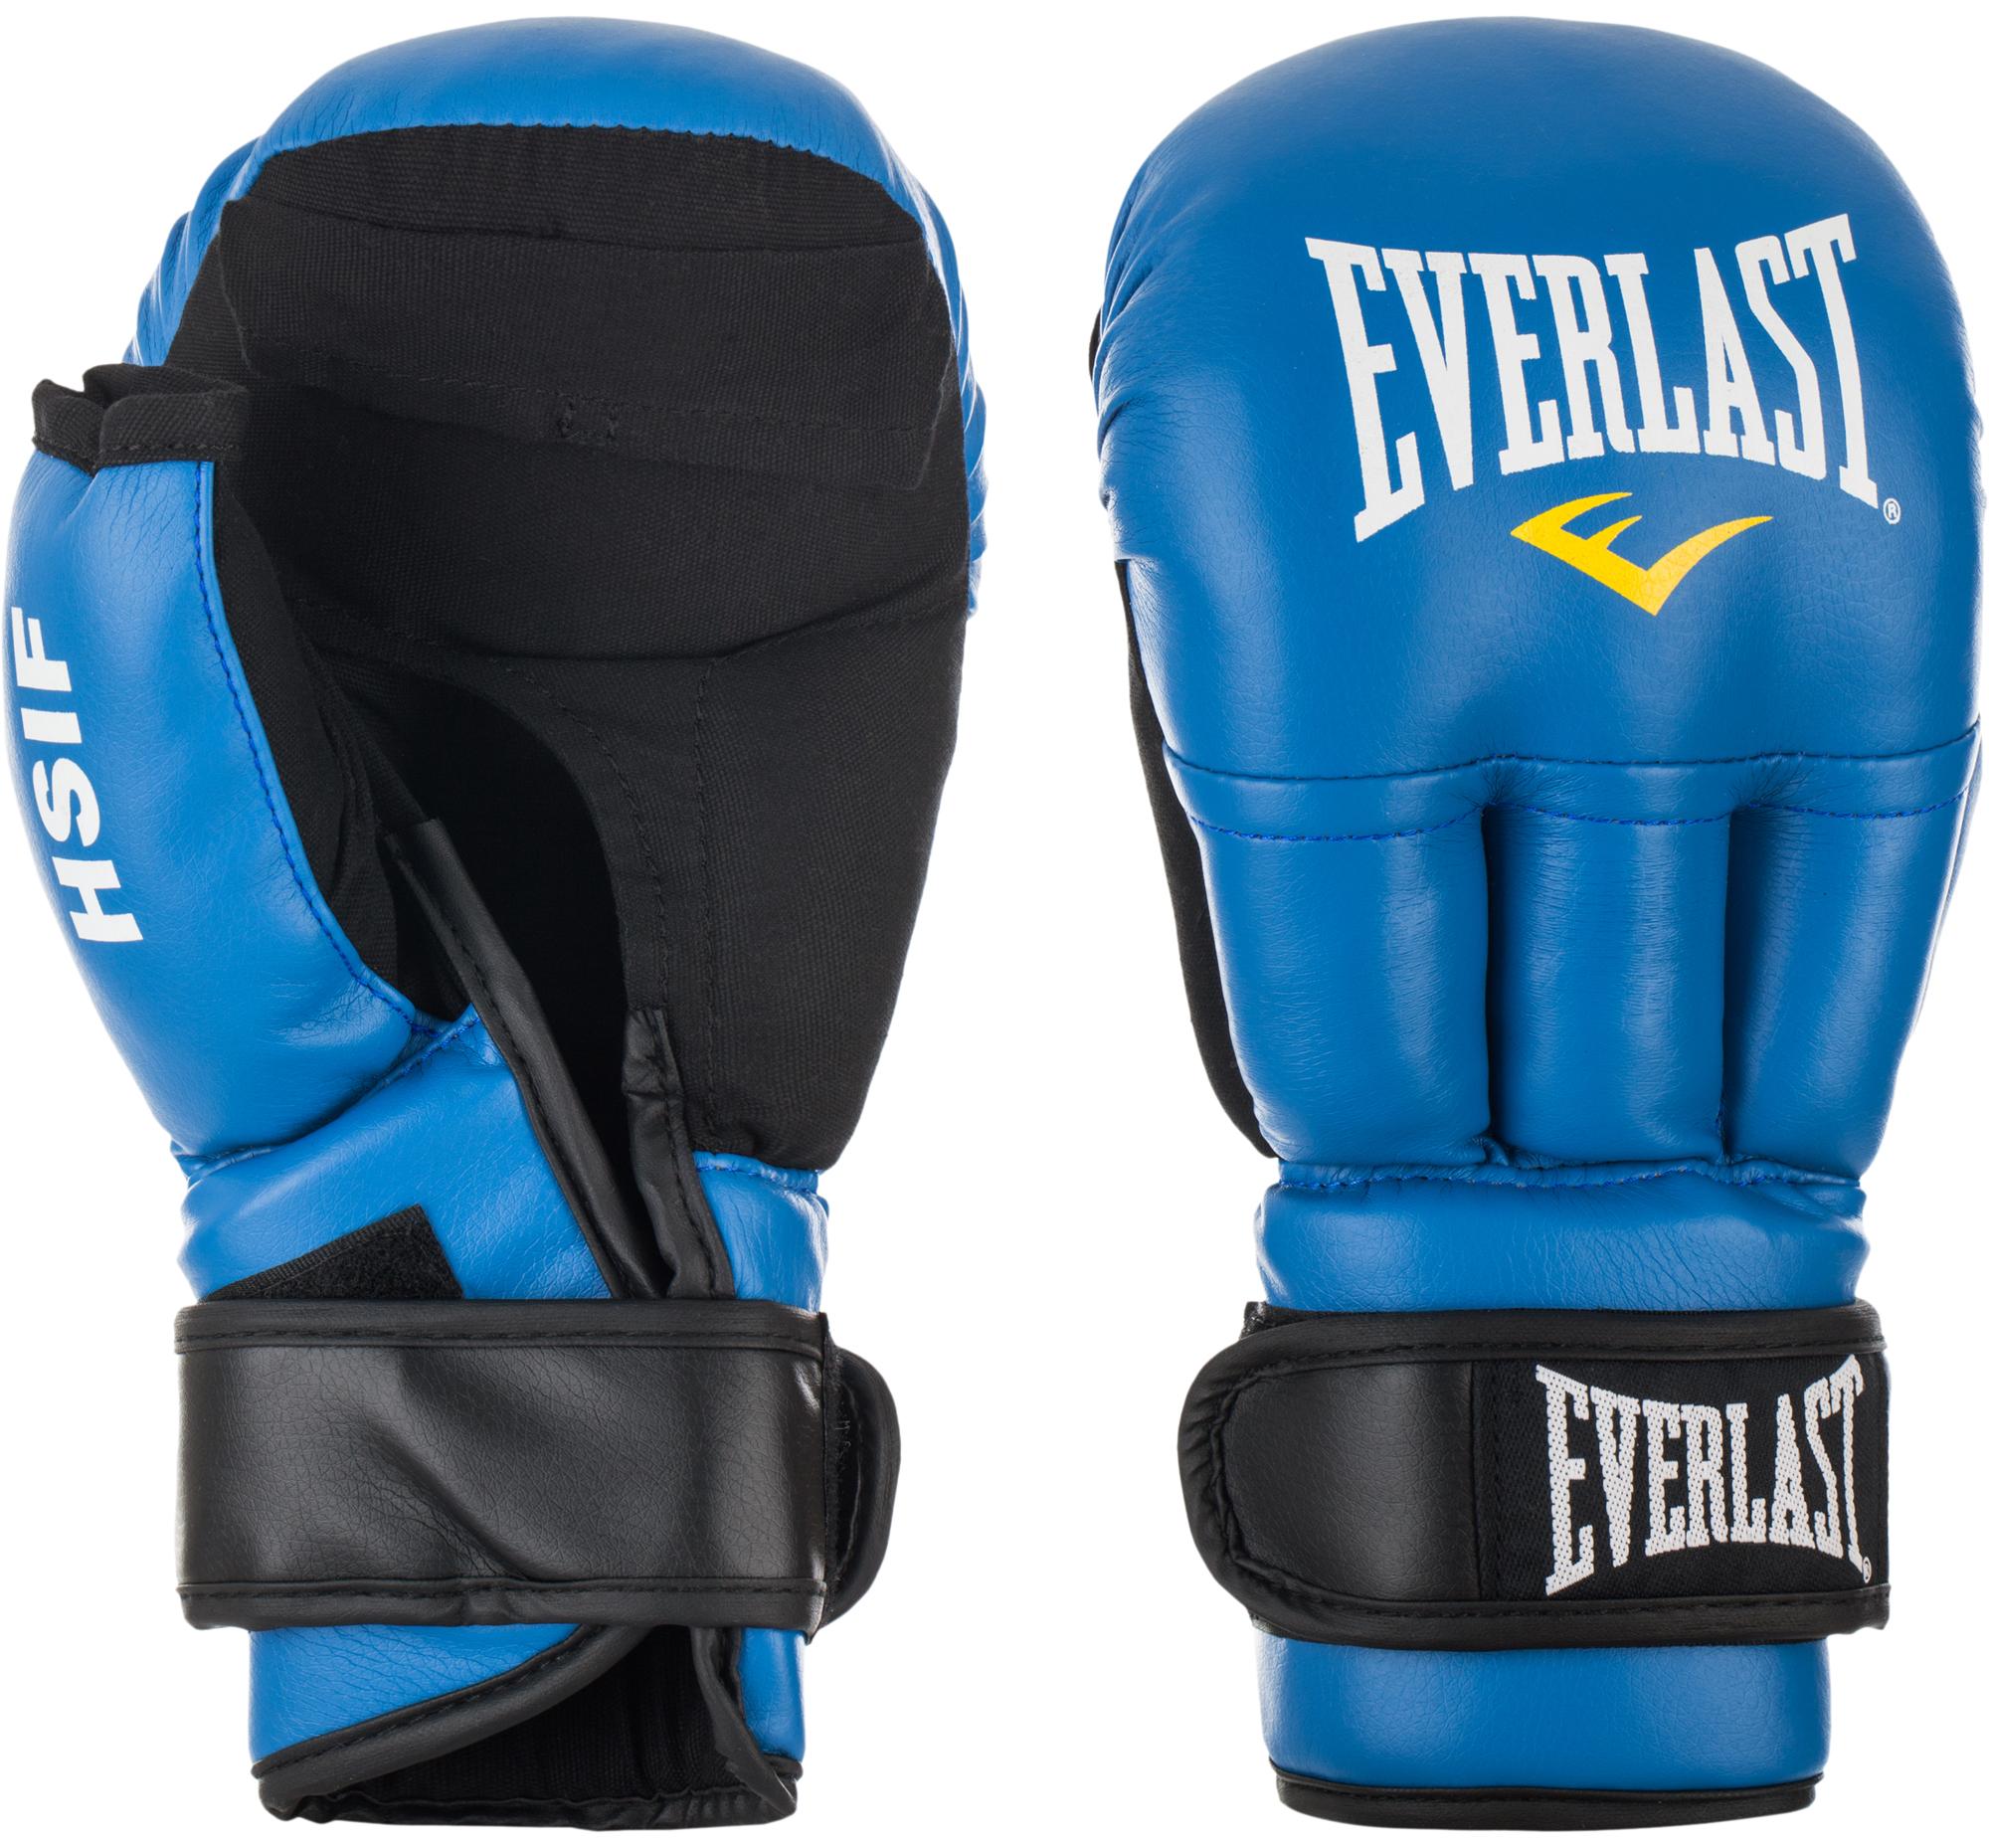 Everlast Перчатки для рукопашного боя Everlast, размер 12 oz цены